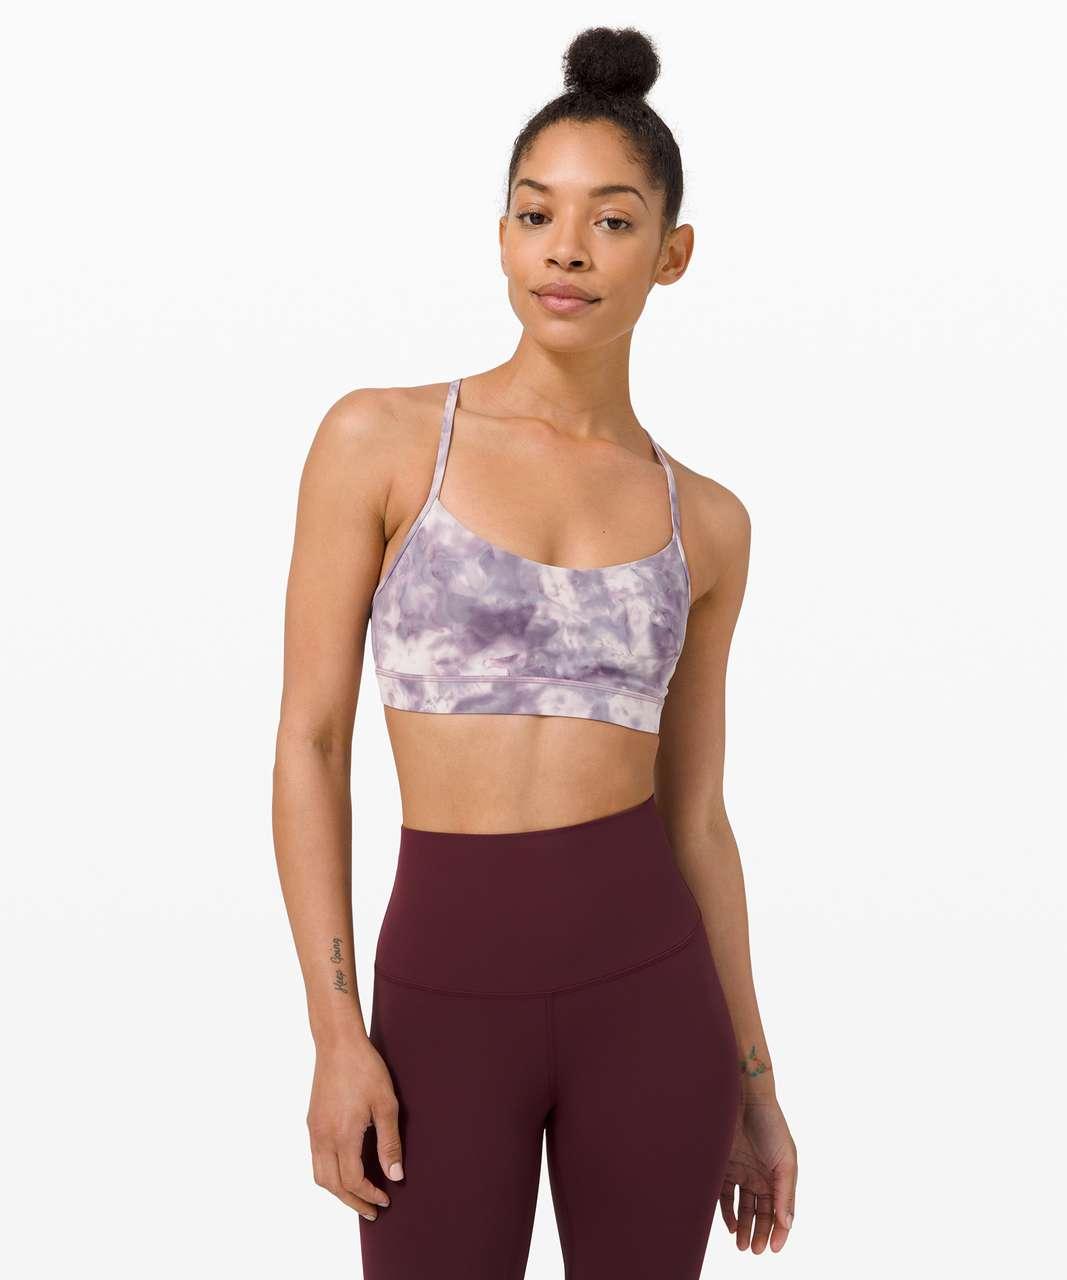 Lululemon Flow Y Bra Nulu *Light Support, B/C Cup - Diamond Dye Pink Bliss Graphite Purple